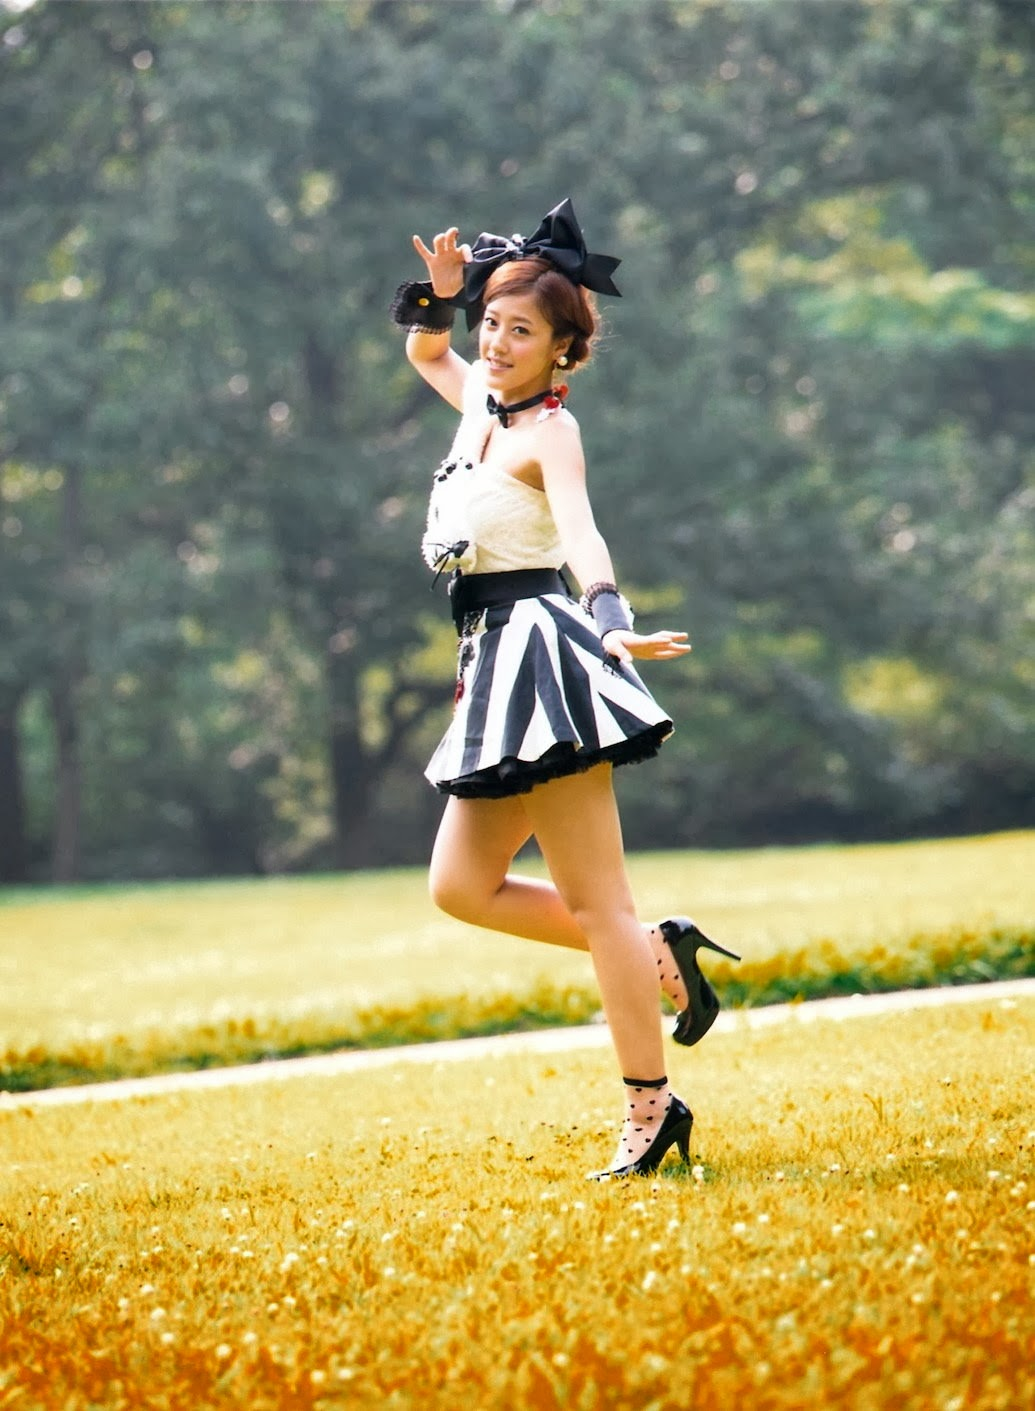 berryz koubou scans de glow idols love